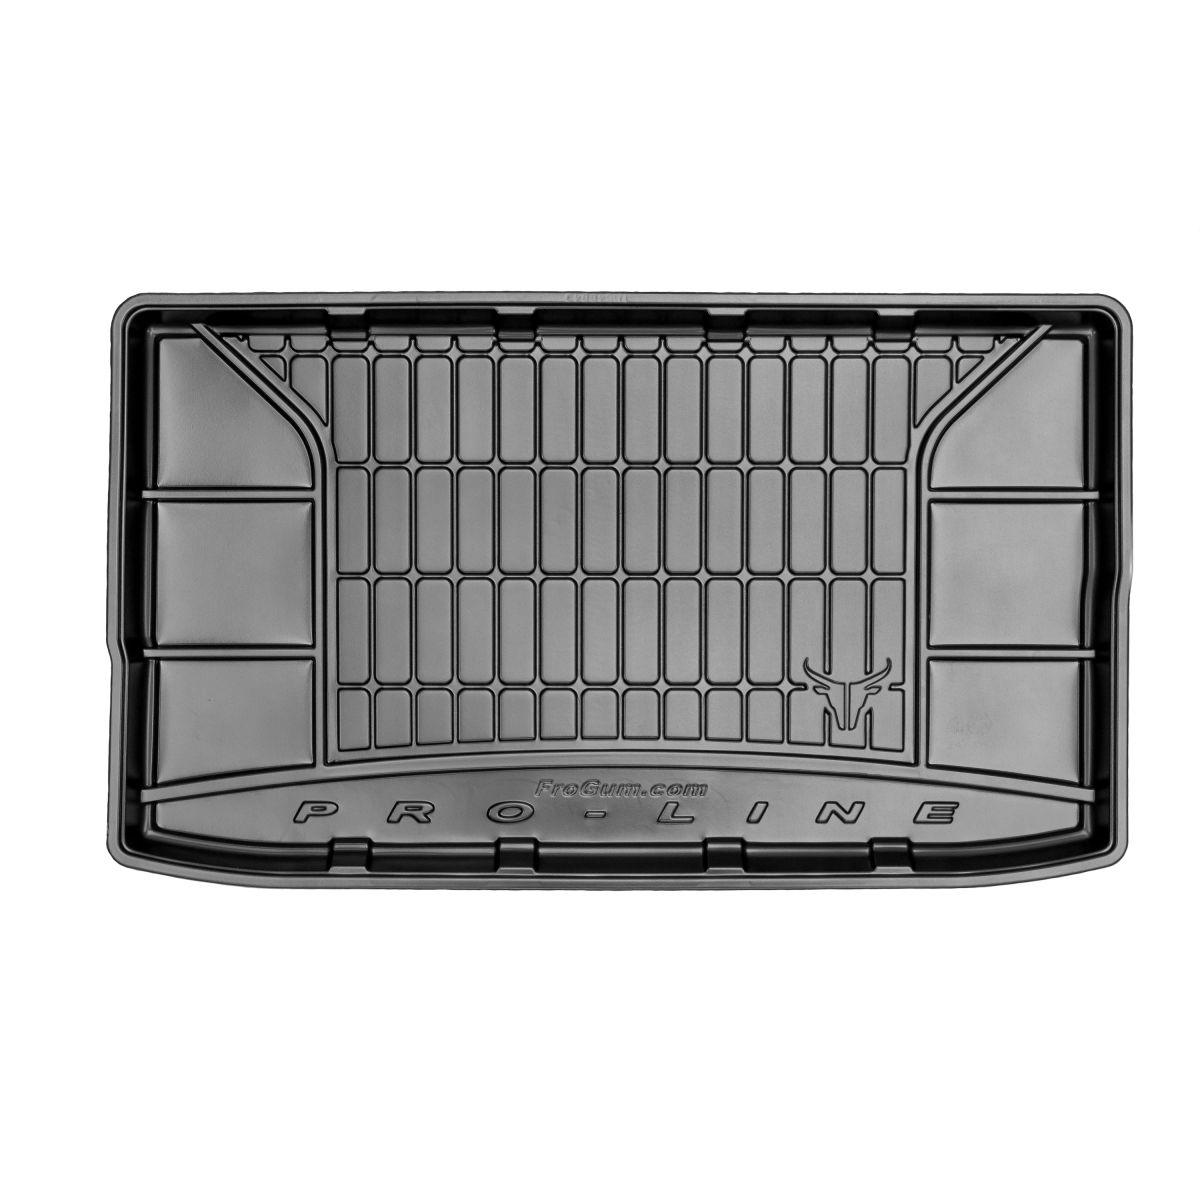 MAMMOOTH Vana do kufru, pro Ford B-MAX (VAN) od r. 2012, černá